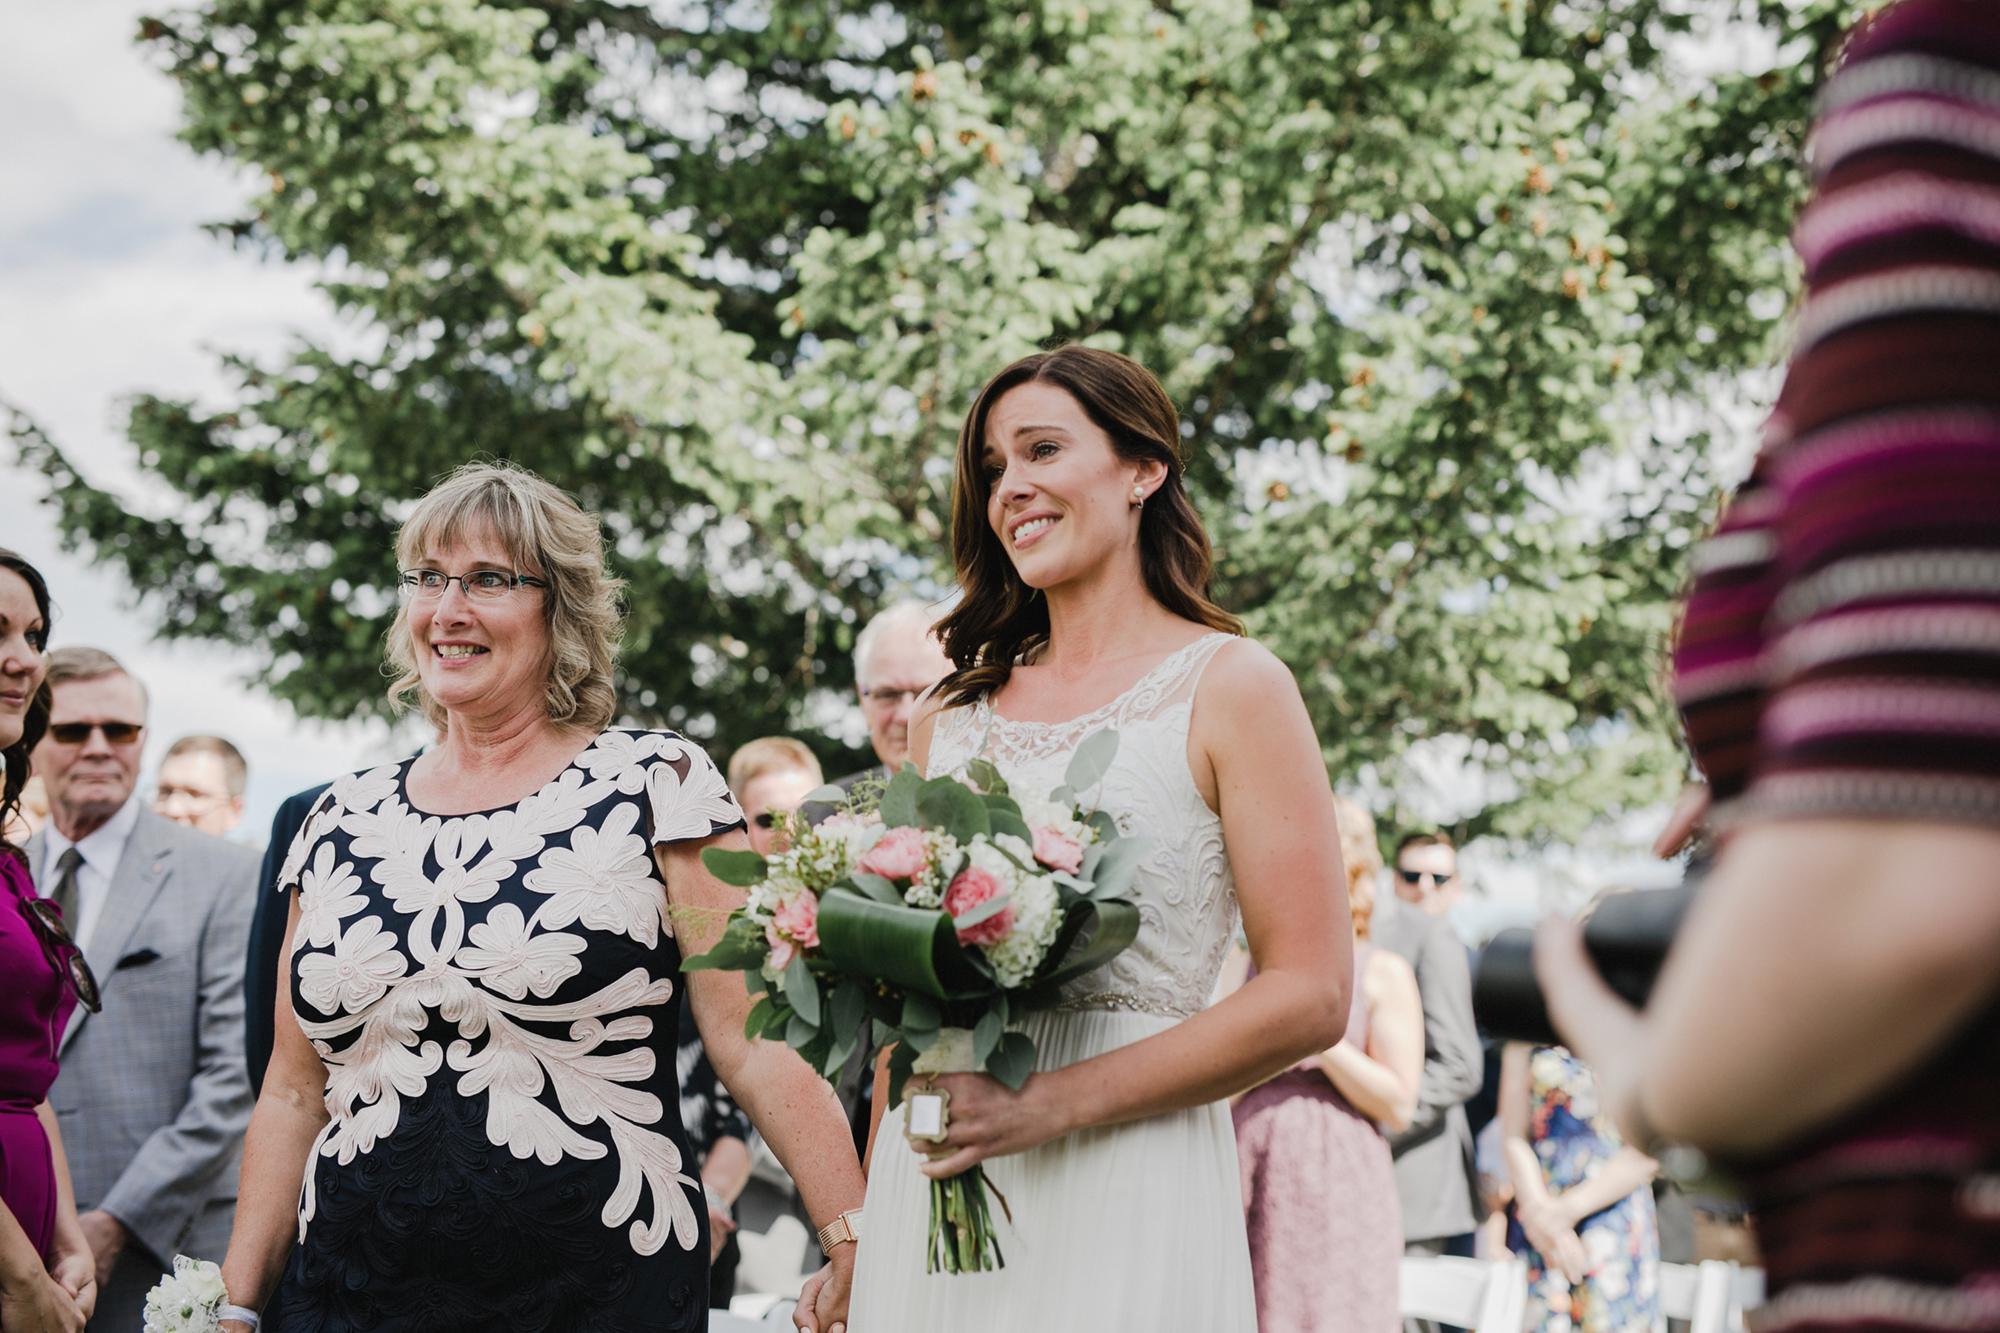 Flower Farm Crowsnest Pass Wedding -050.JPG